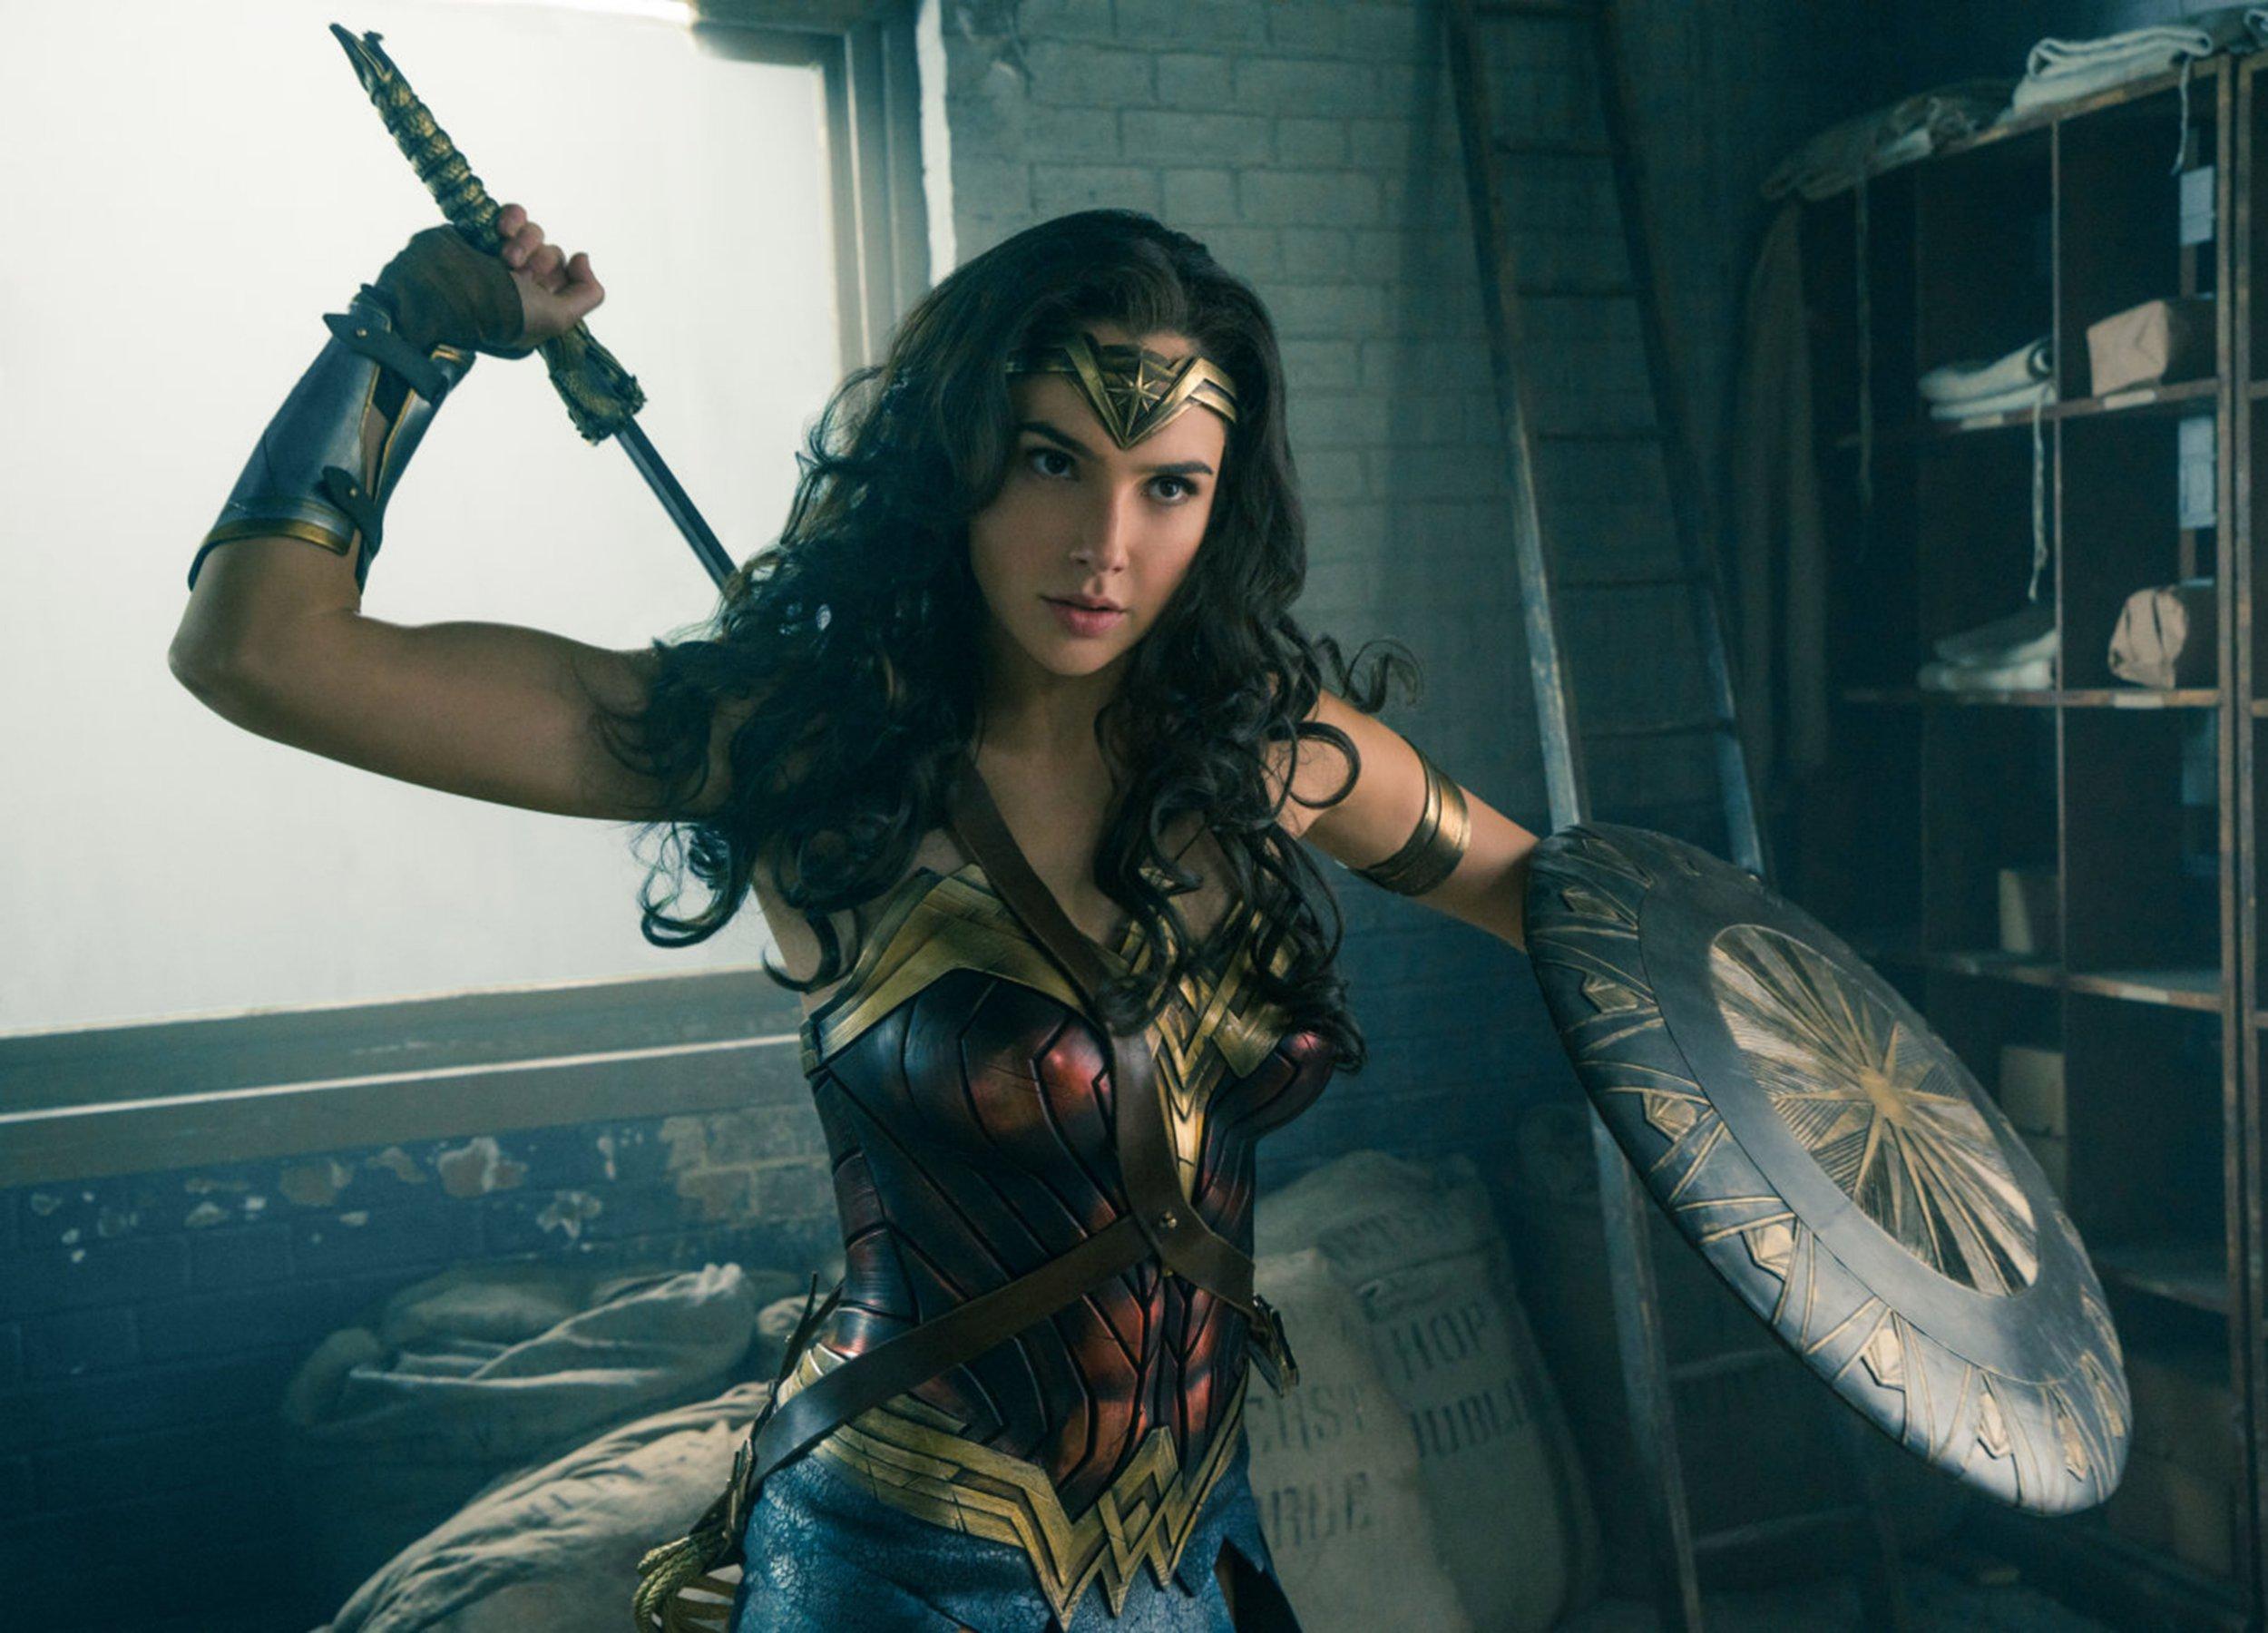 Warner Bros announces Wonder Woman 2 set for Christmas 2019 release